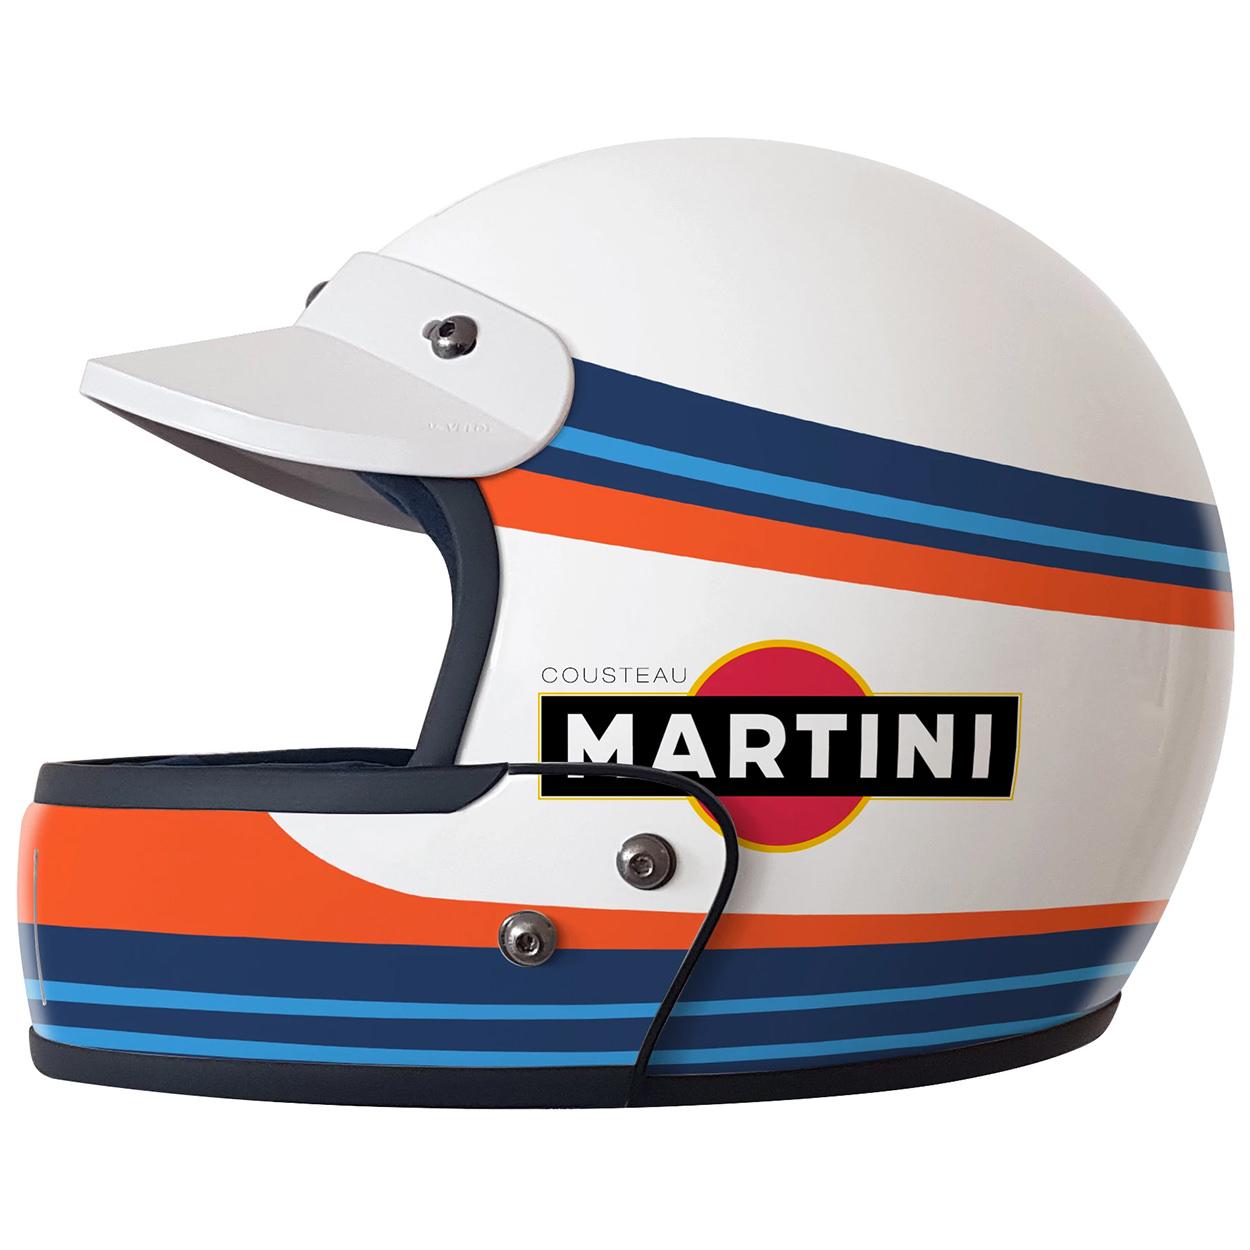 Custom motorcycle helmet designer Hello Cousteau